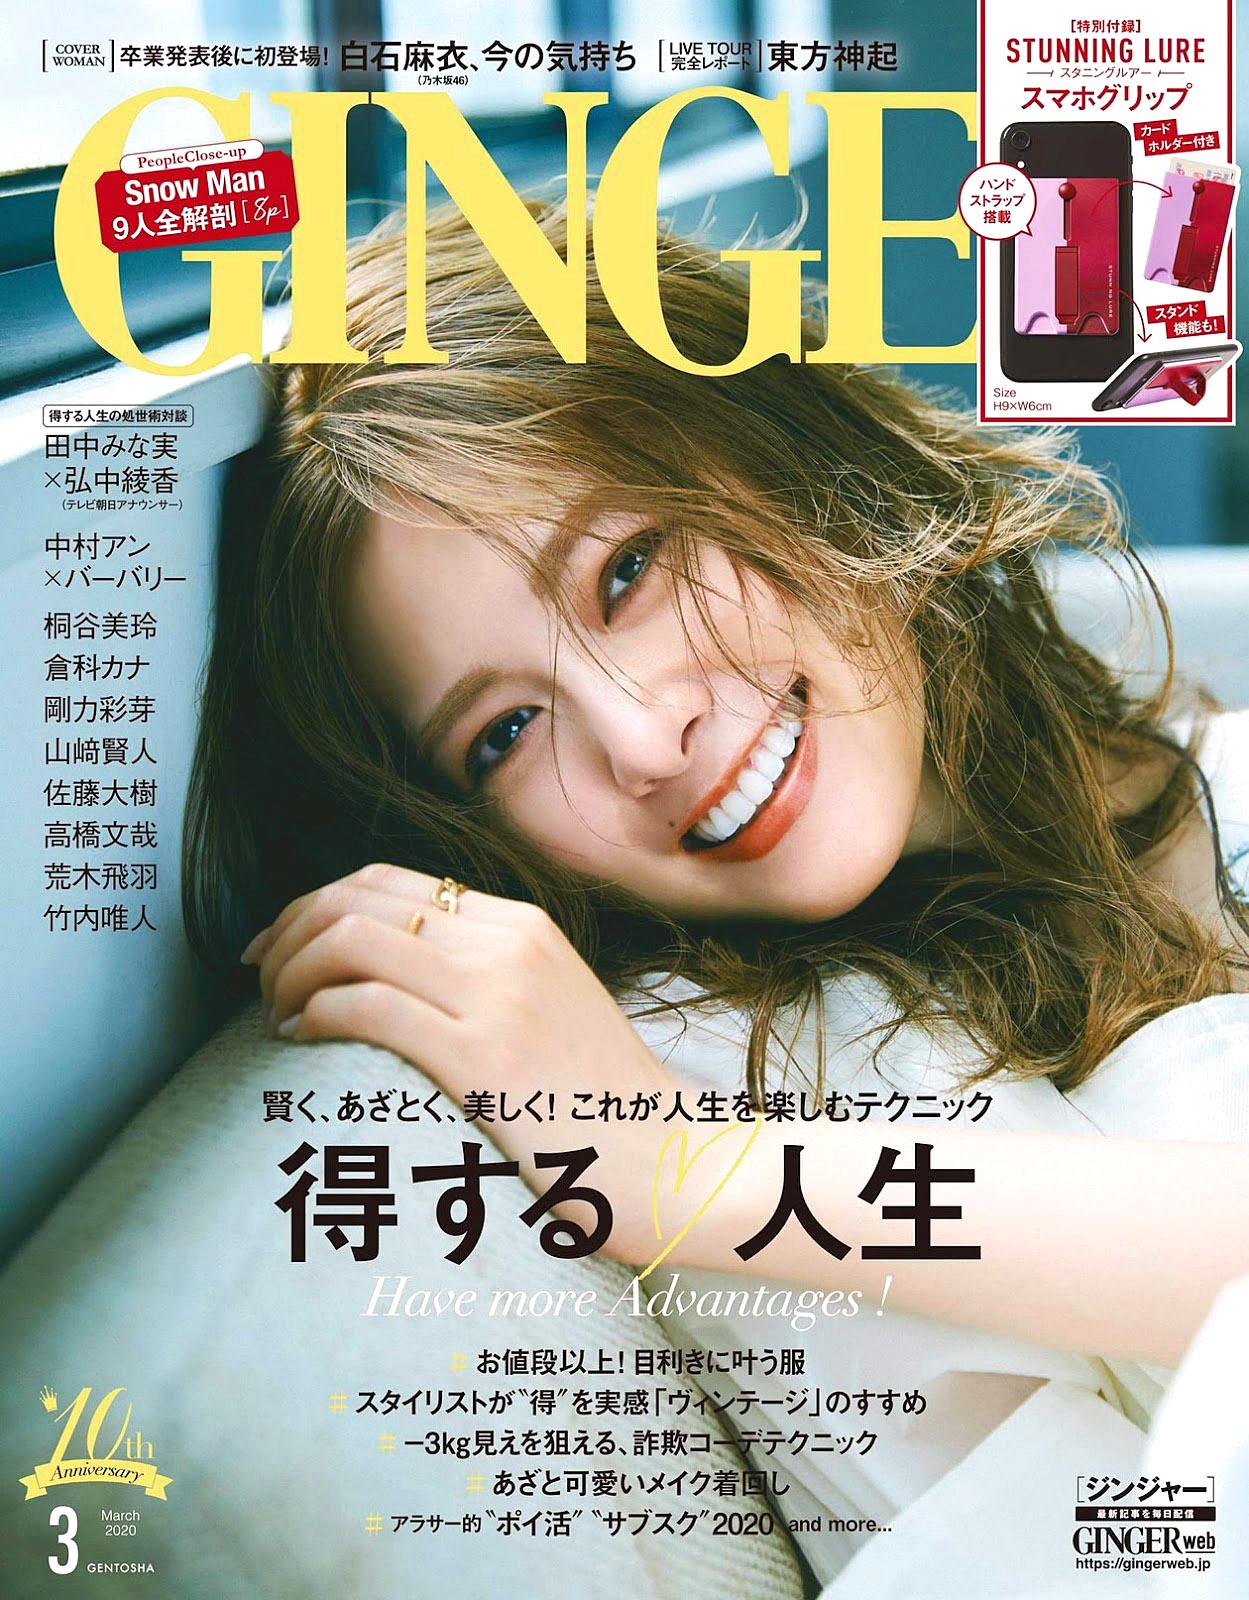 MShiraishi Ginger 2003 00.jpg